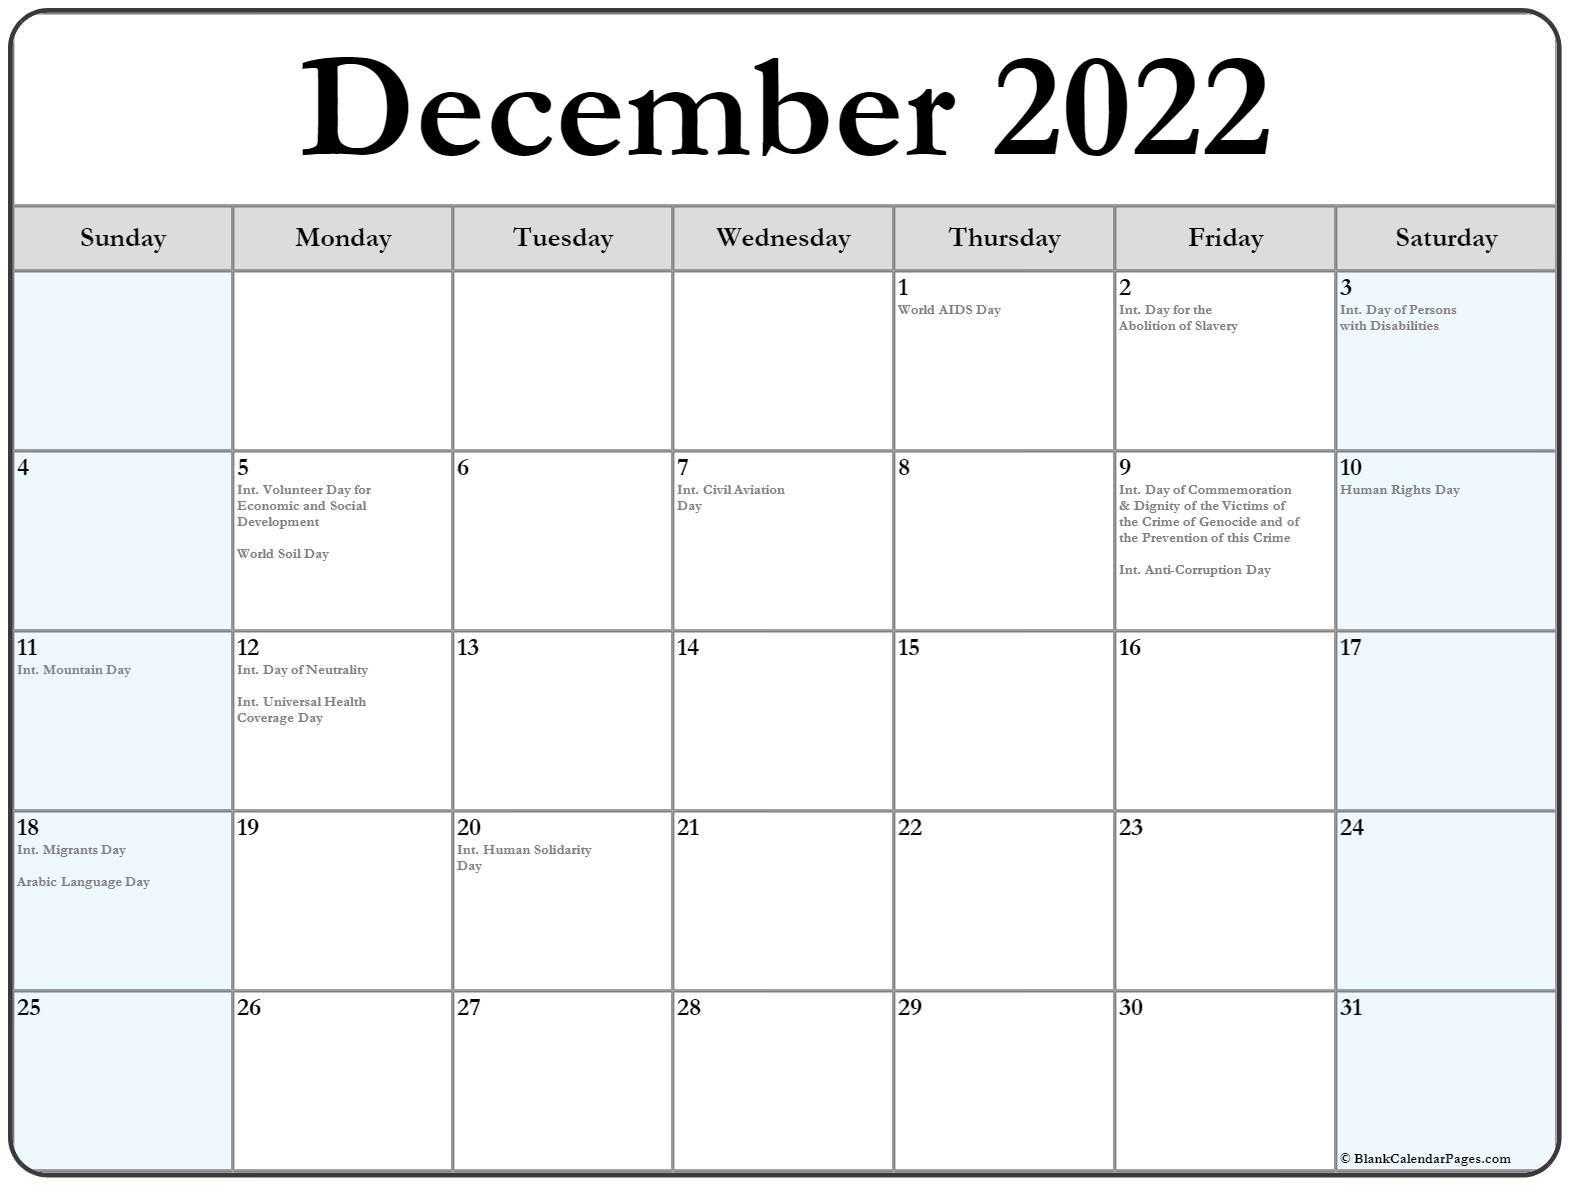 December 2020 with international holidays